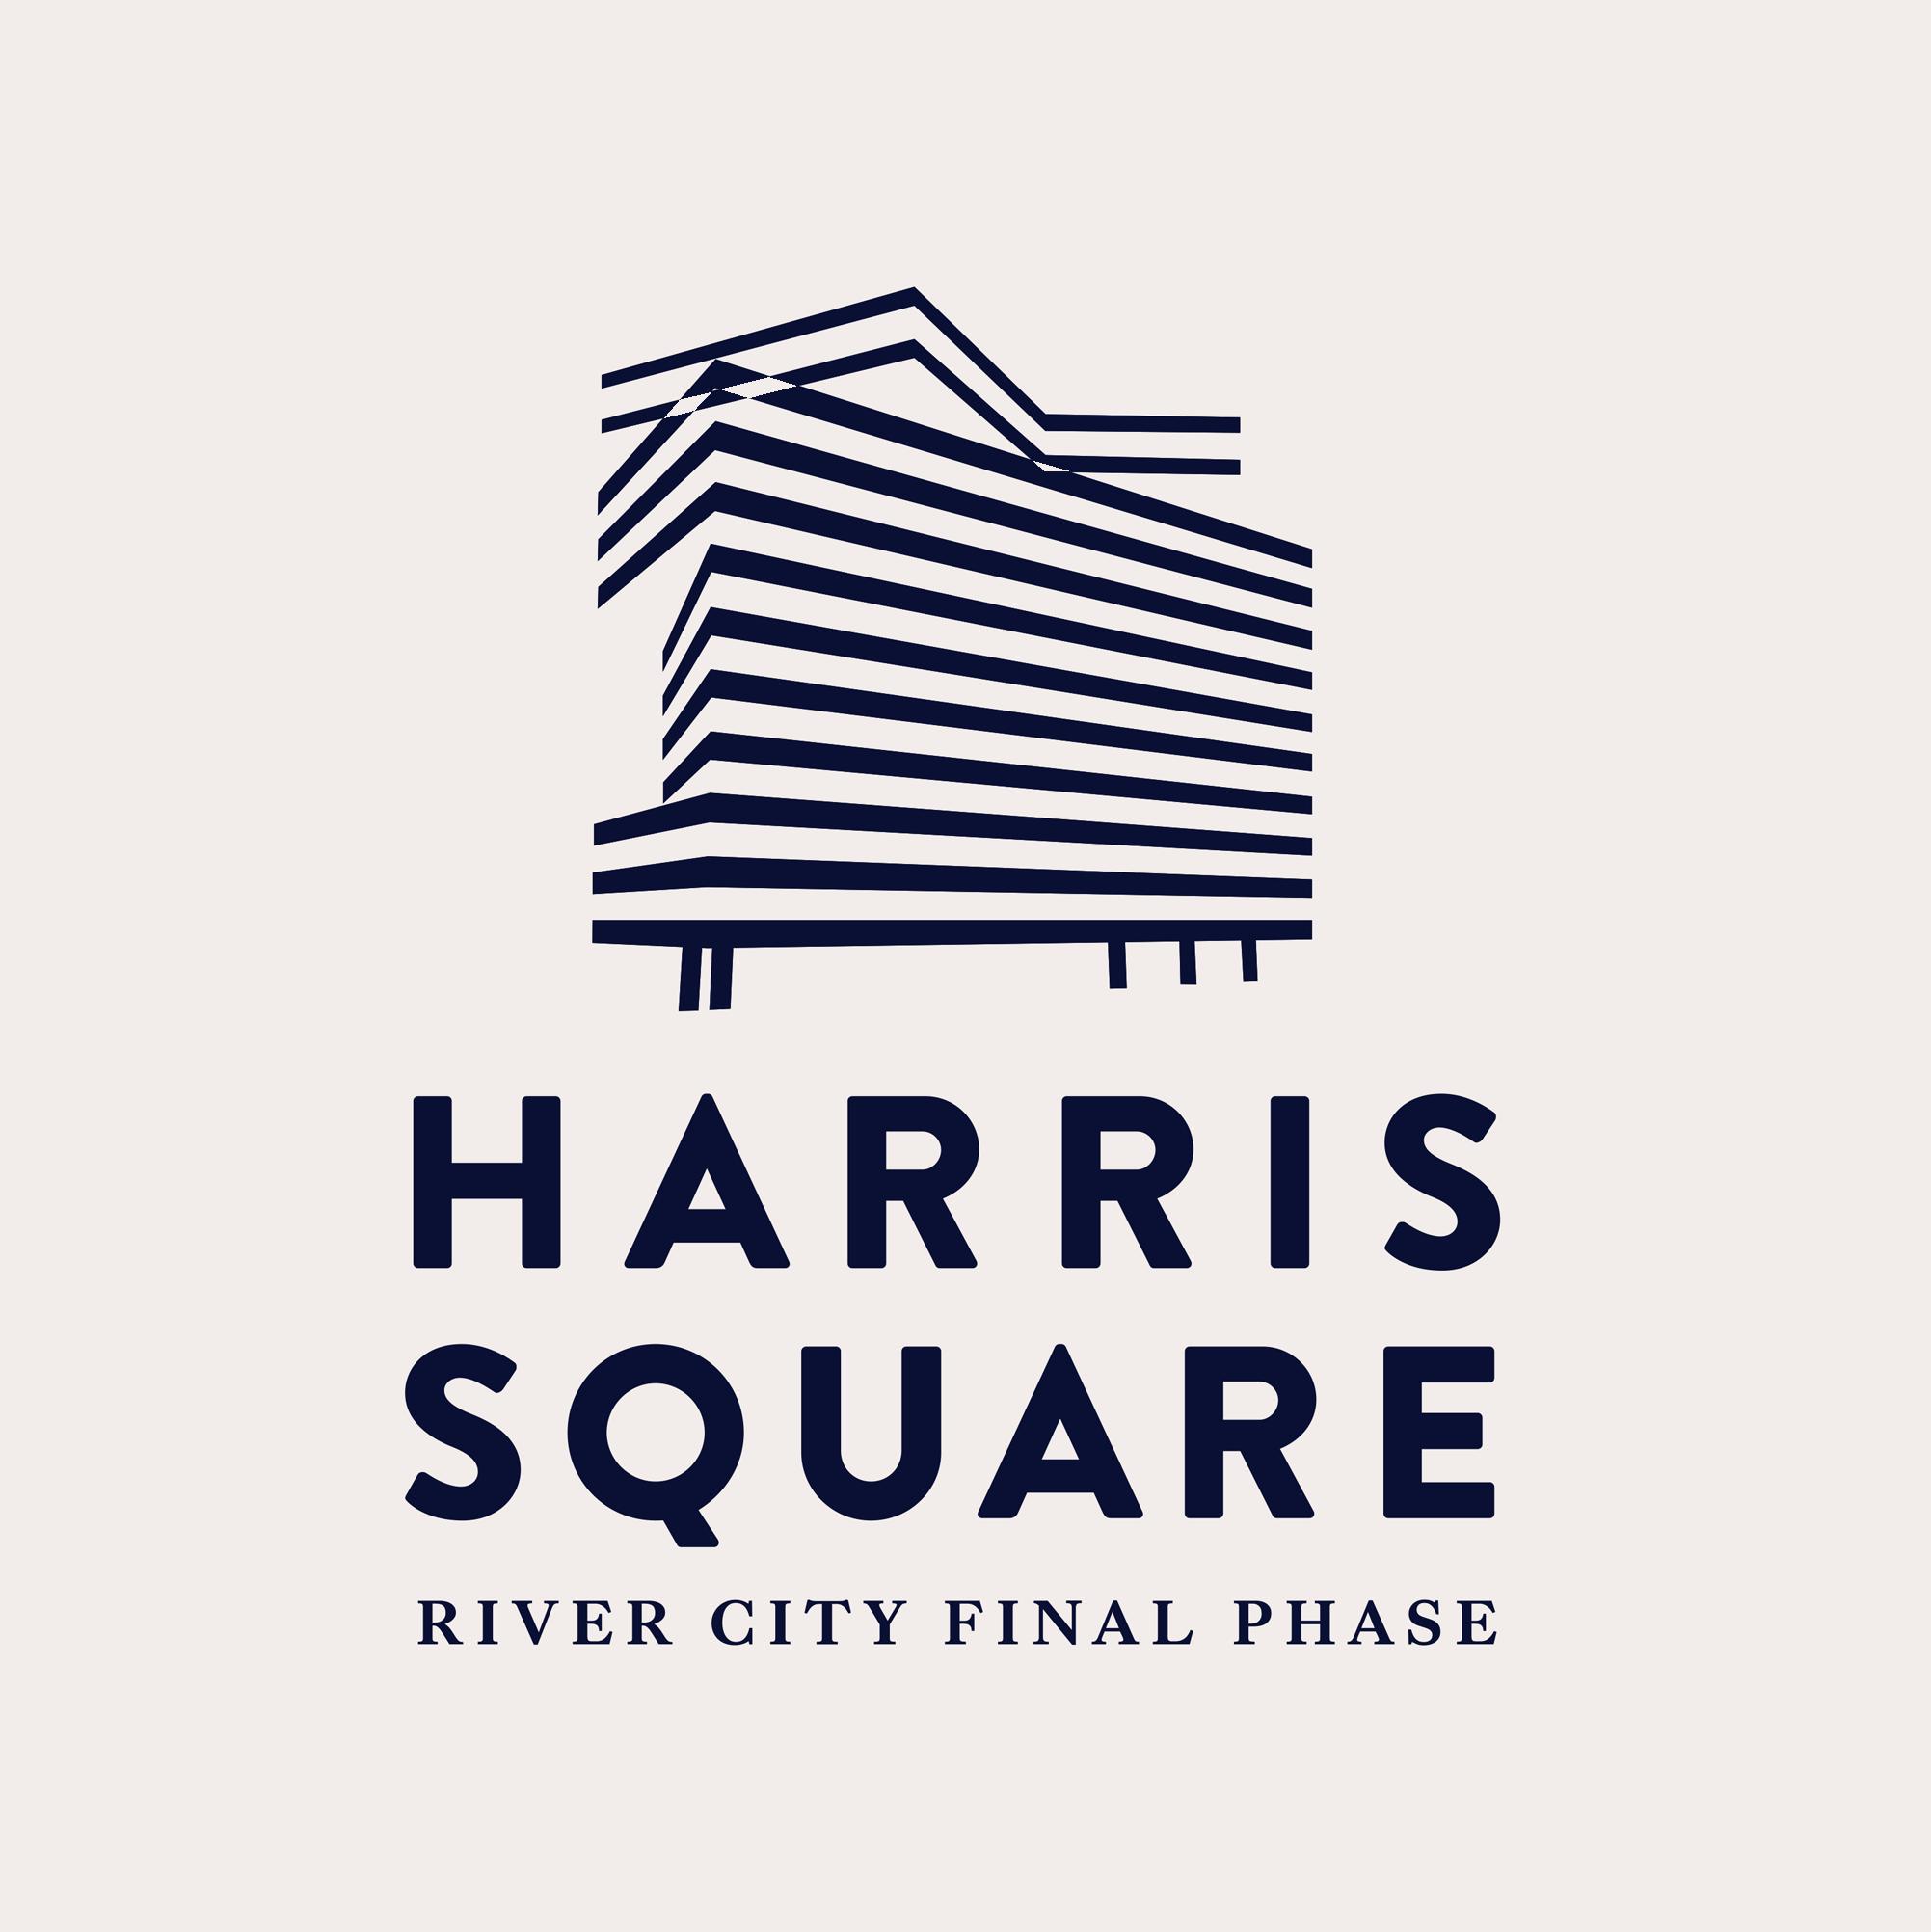 Urban Capital - brand, logo, advertising